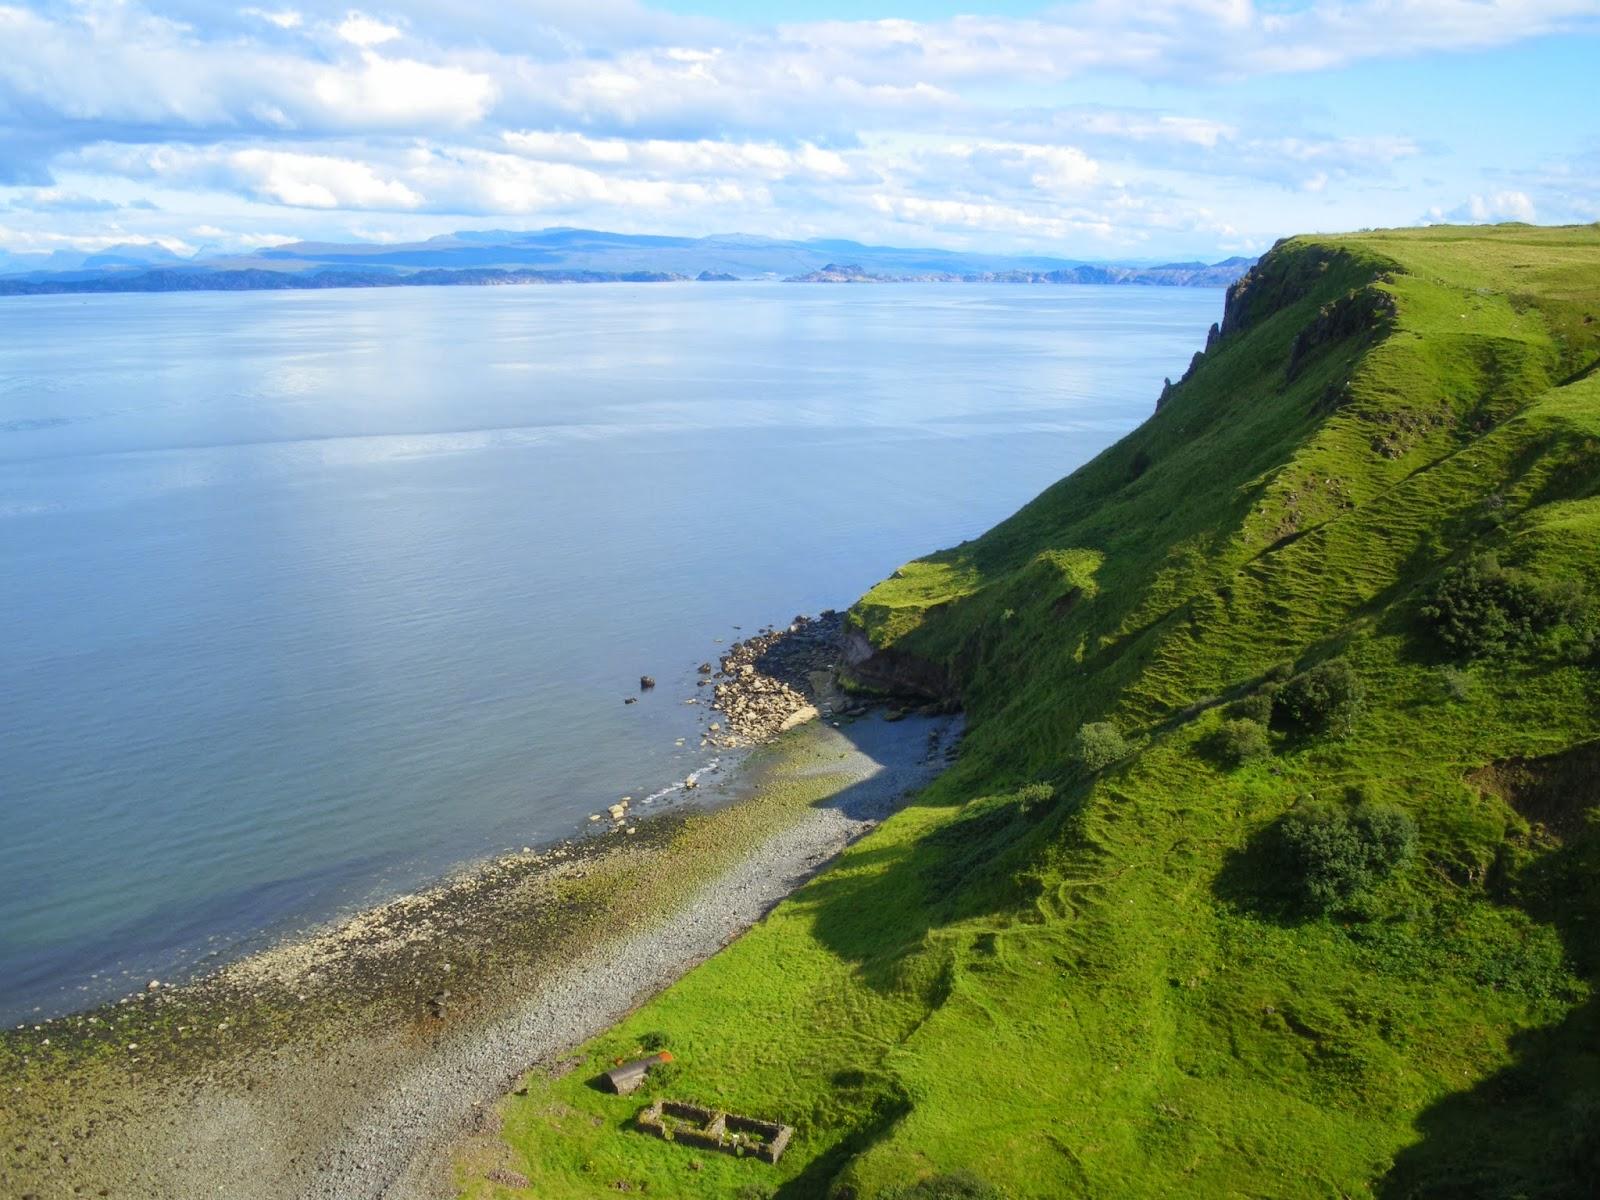 Isle of Skye, Trotternish, Highlands, Scotland, Escocia, United Kingdom, Inver Tote, Lealth Valley